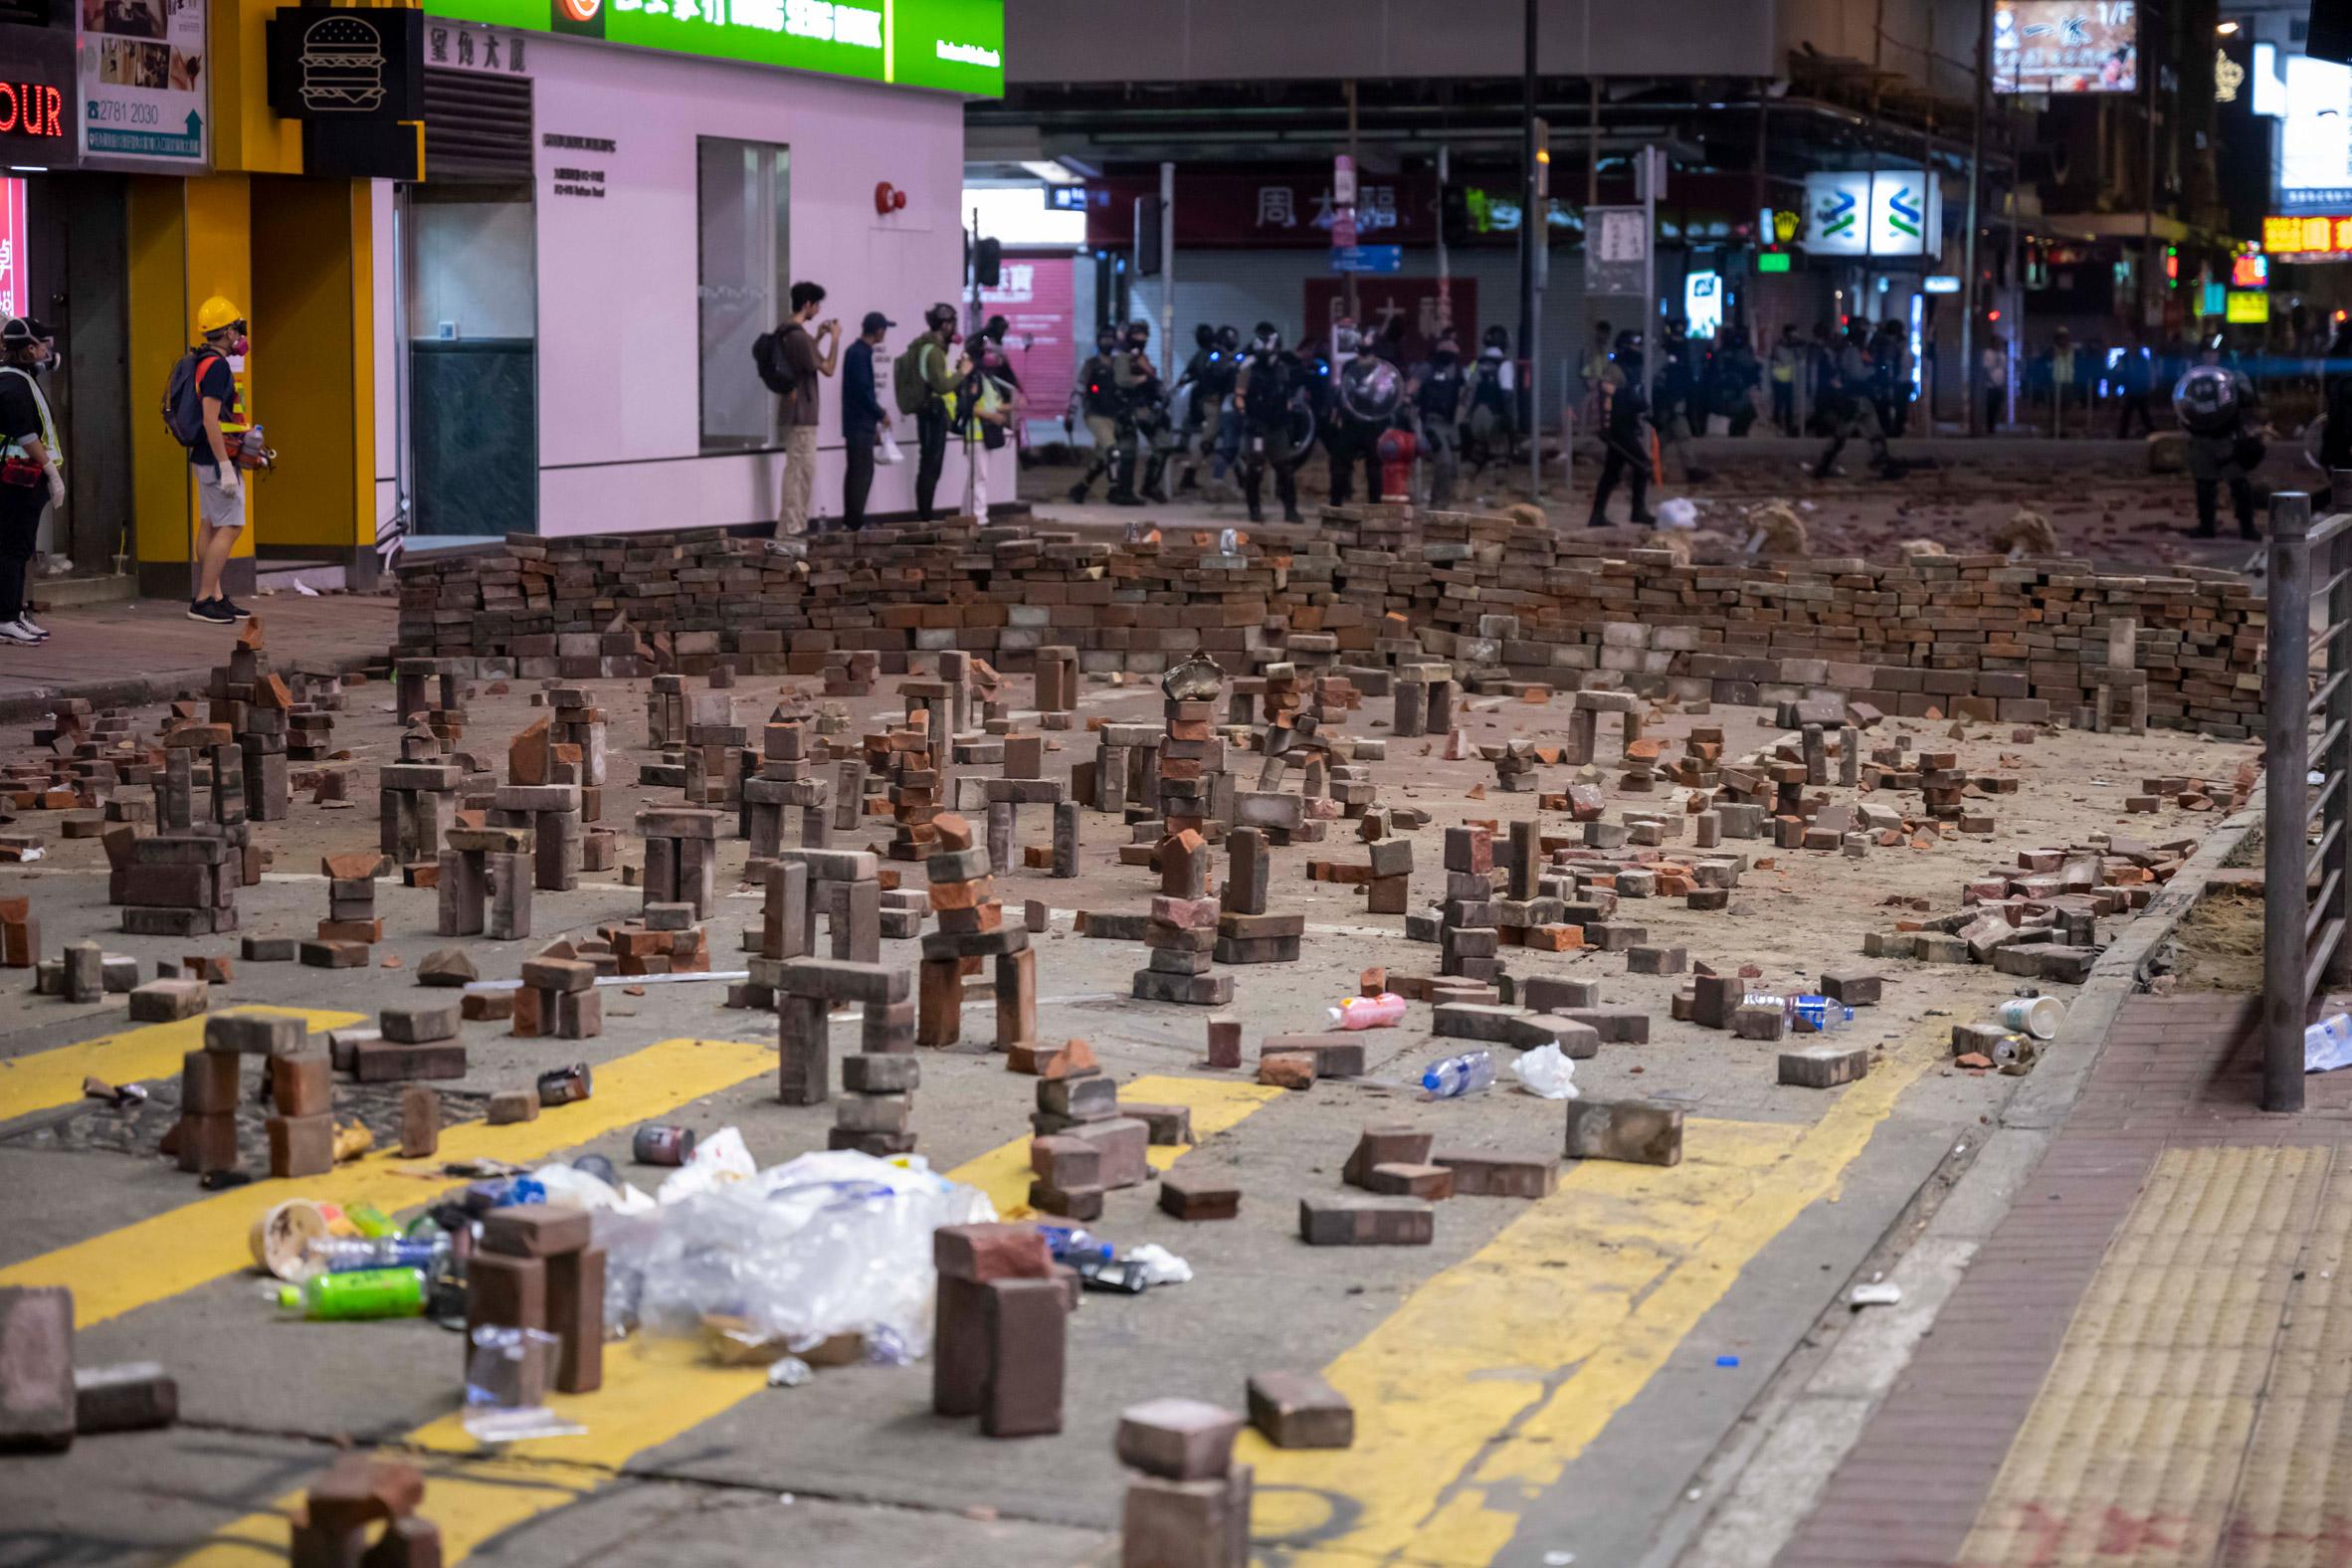 The roadblocks form buttresses from three bricks